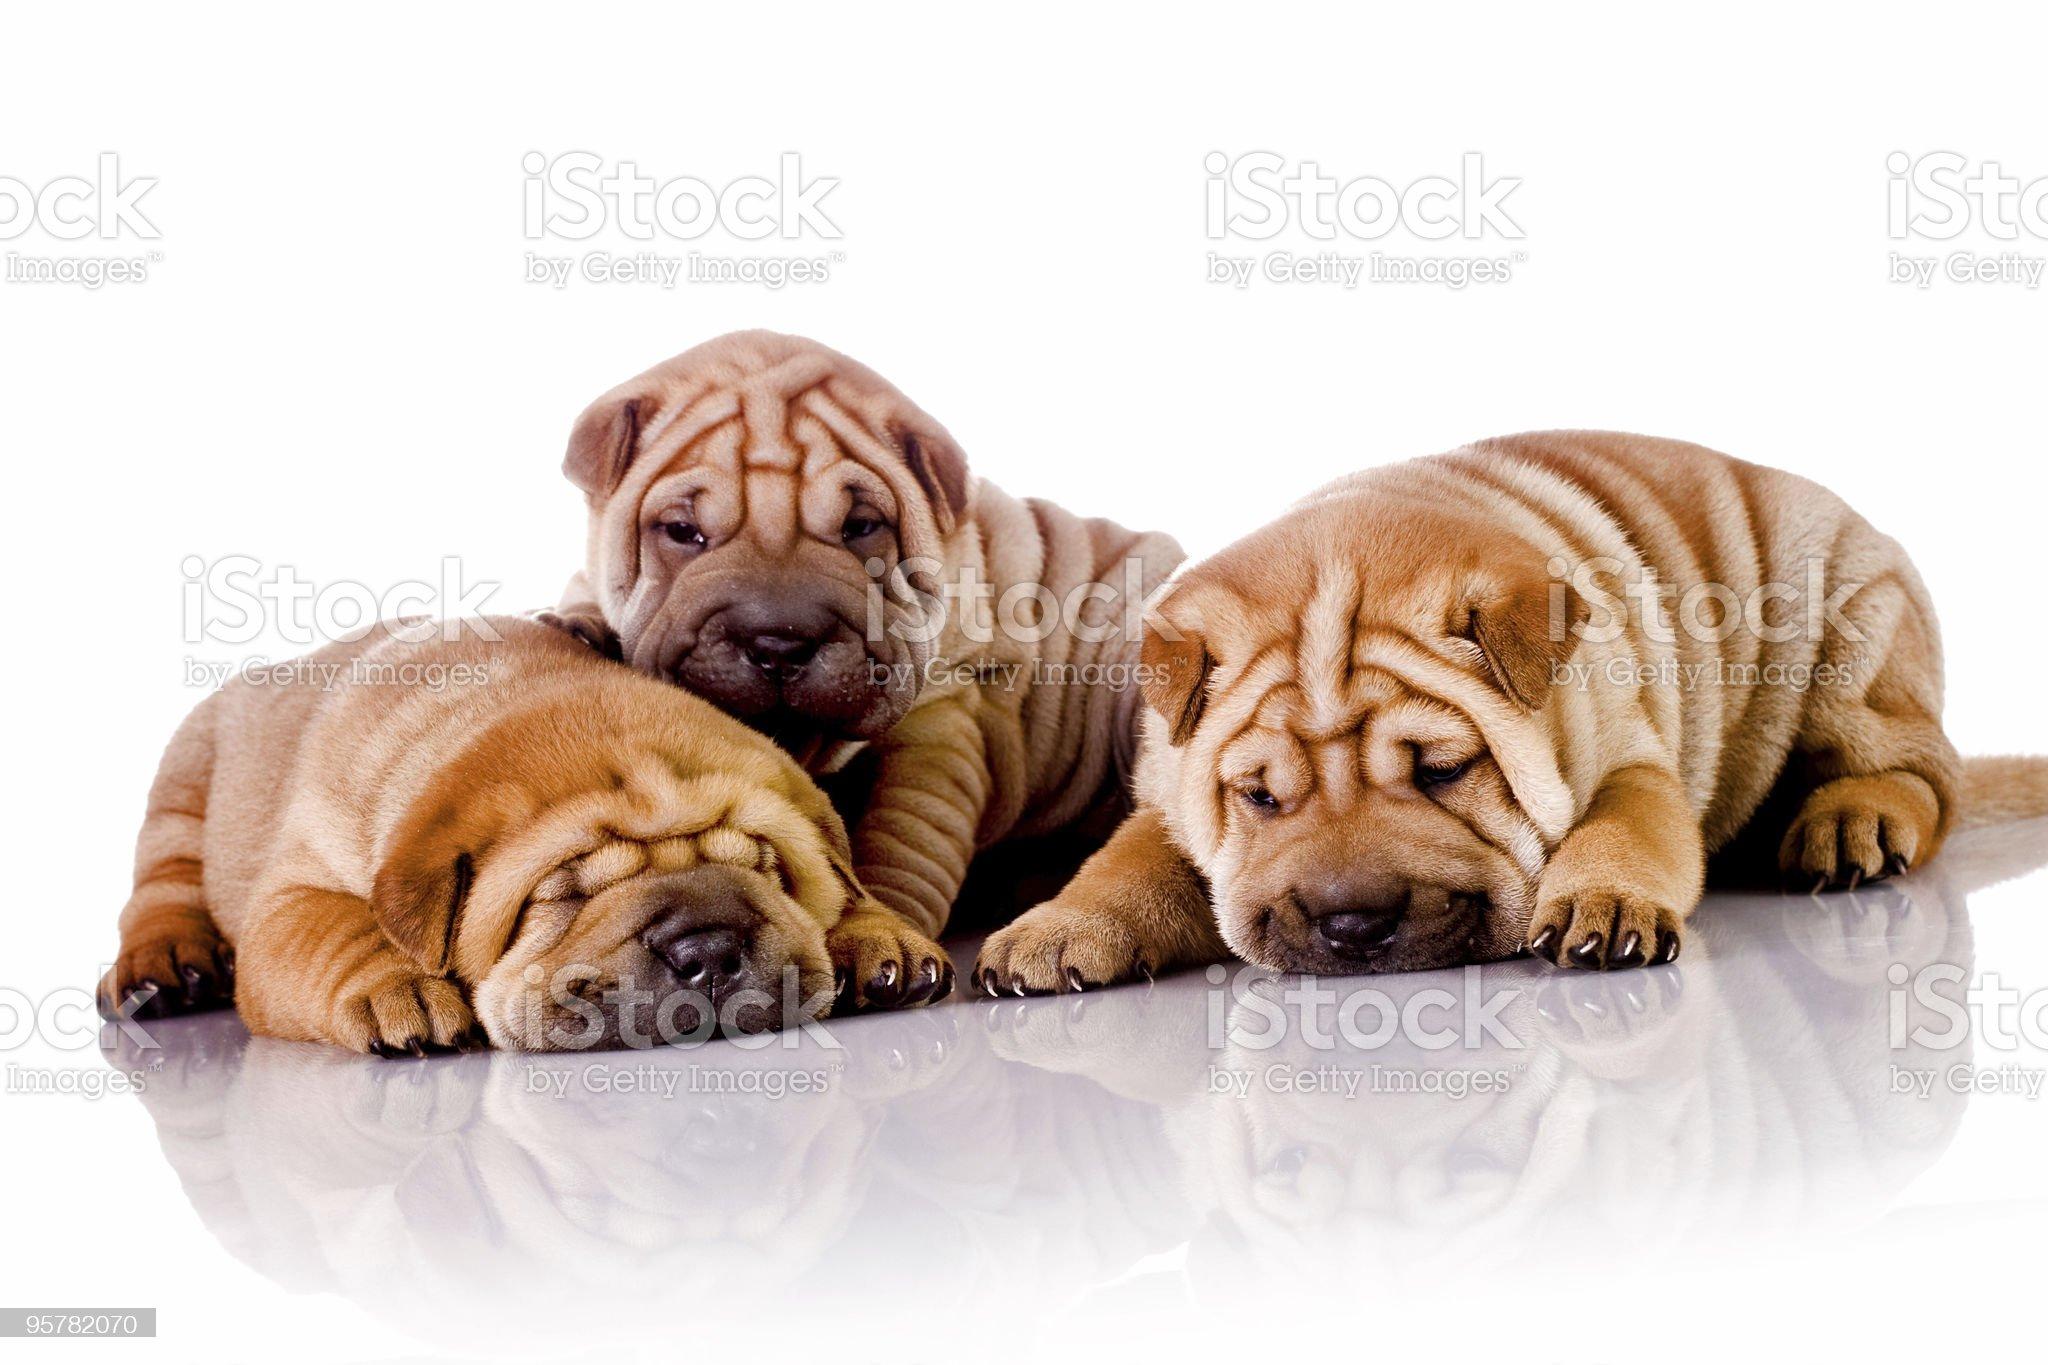 three Shar Pei baby dogs royalty-free stock photo